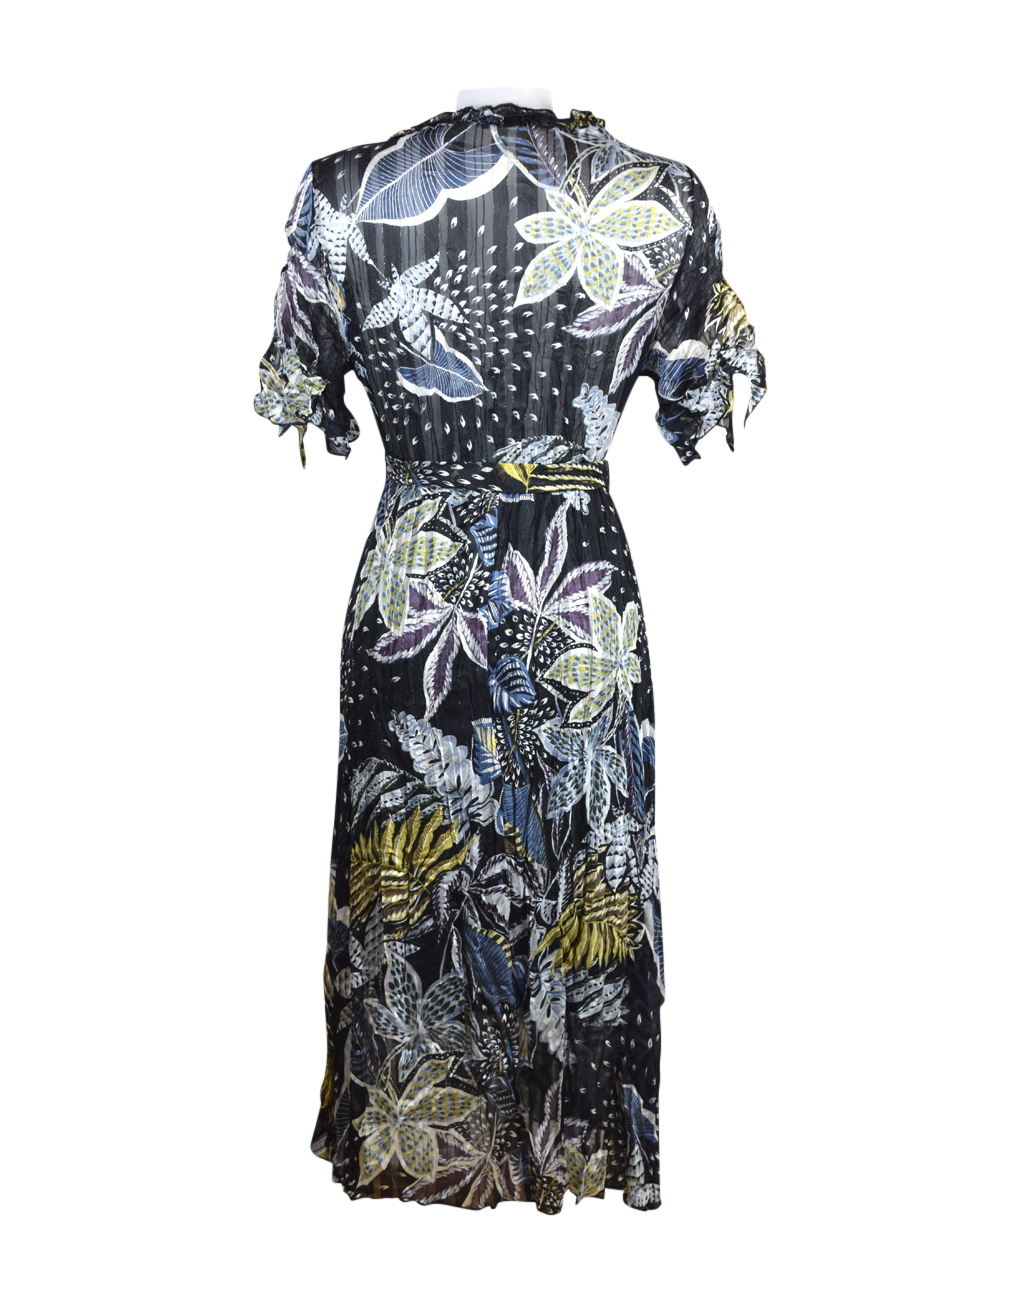 2010 20H Sensations Pour Elle Black Leaf Sleeve Dress One Size